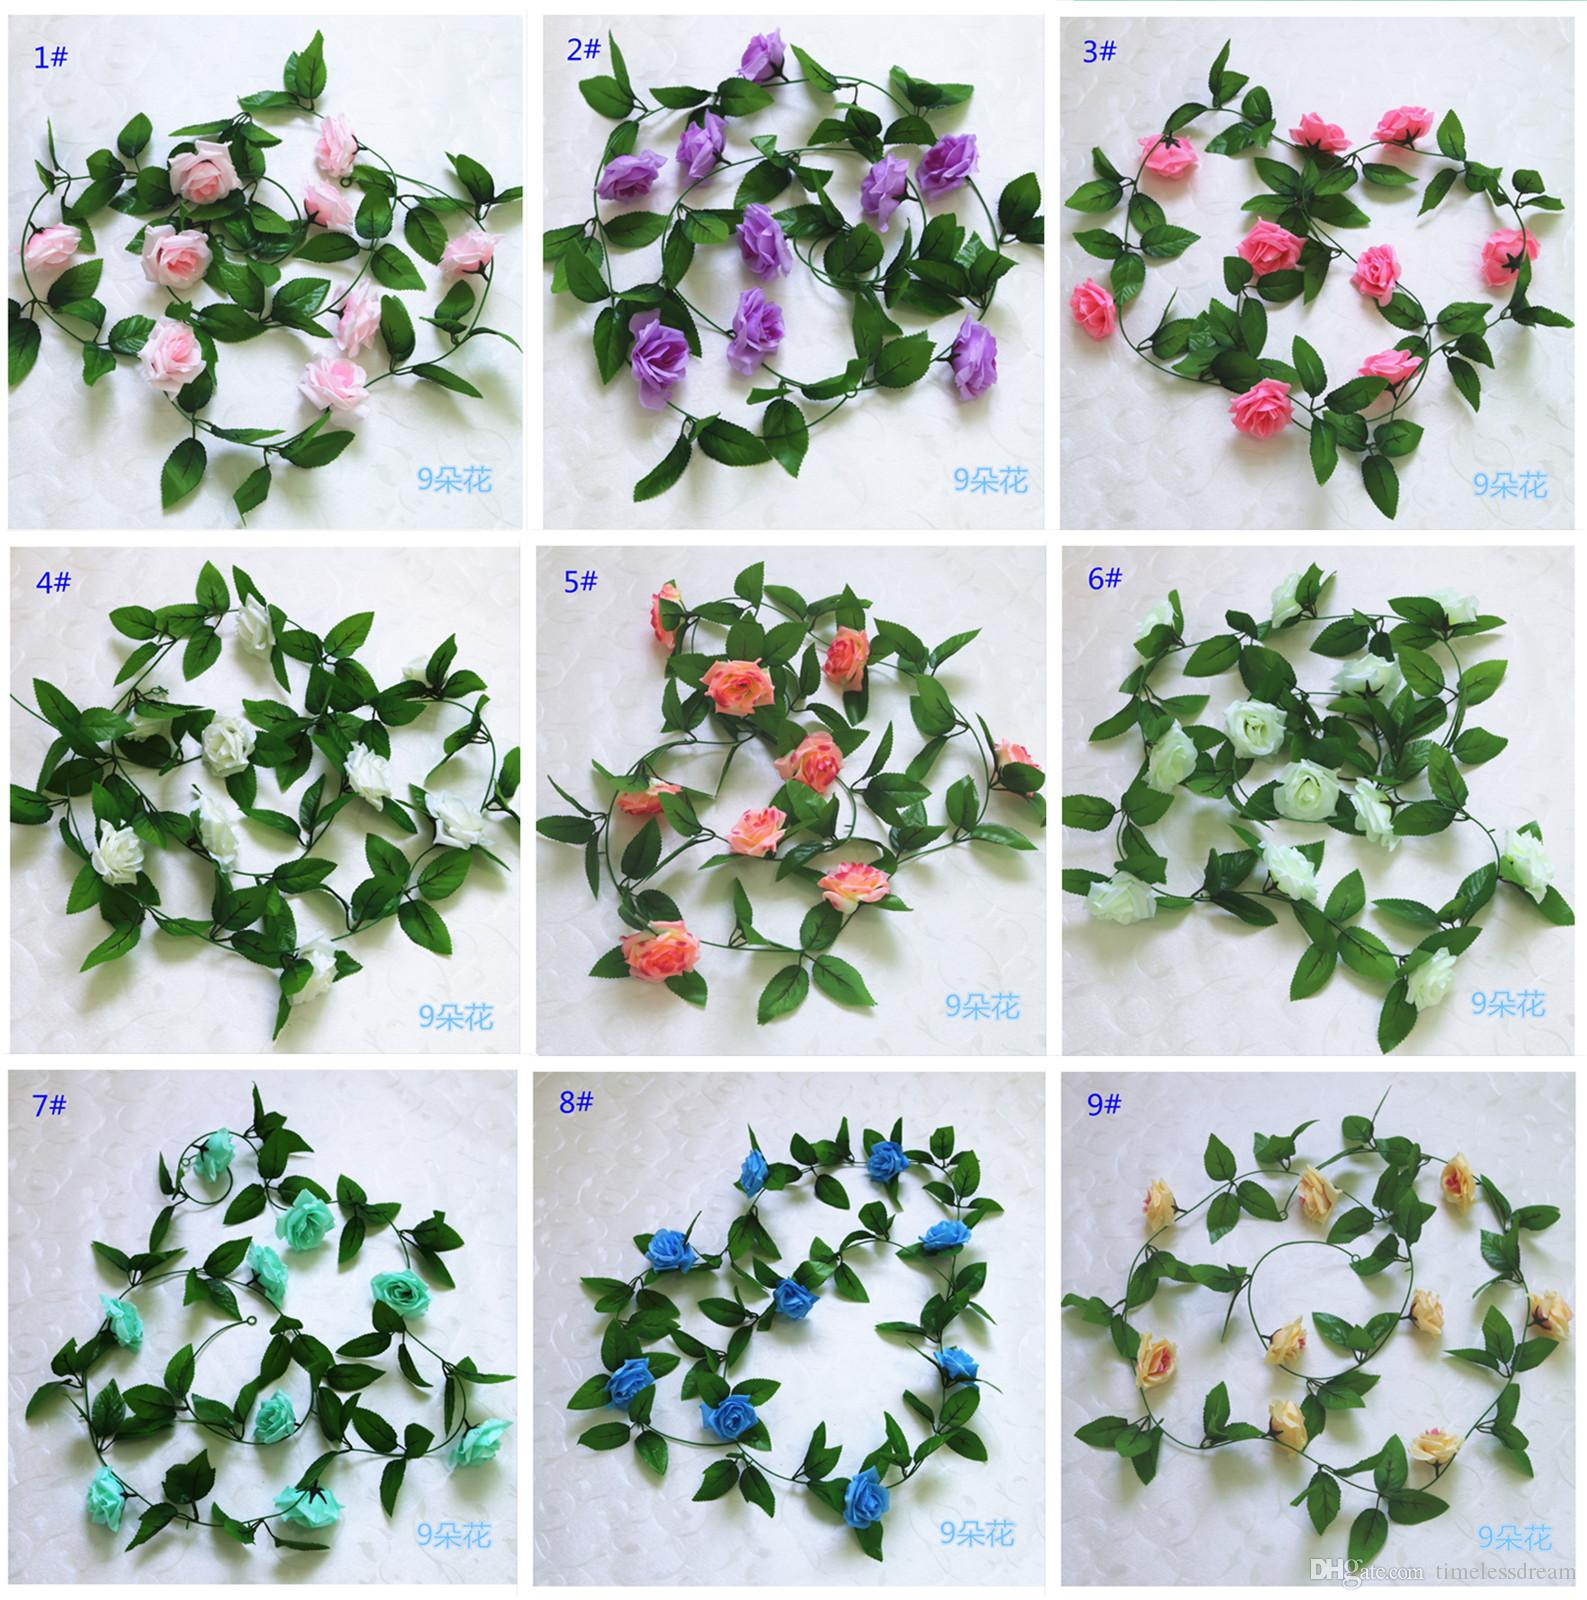 2019 245cm Artificial Silk Flower Rattan Wedding Decoration Artificial Rose Flower Vine Party Diy Decor Photography Props Flowers Garland From